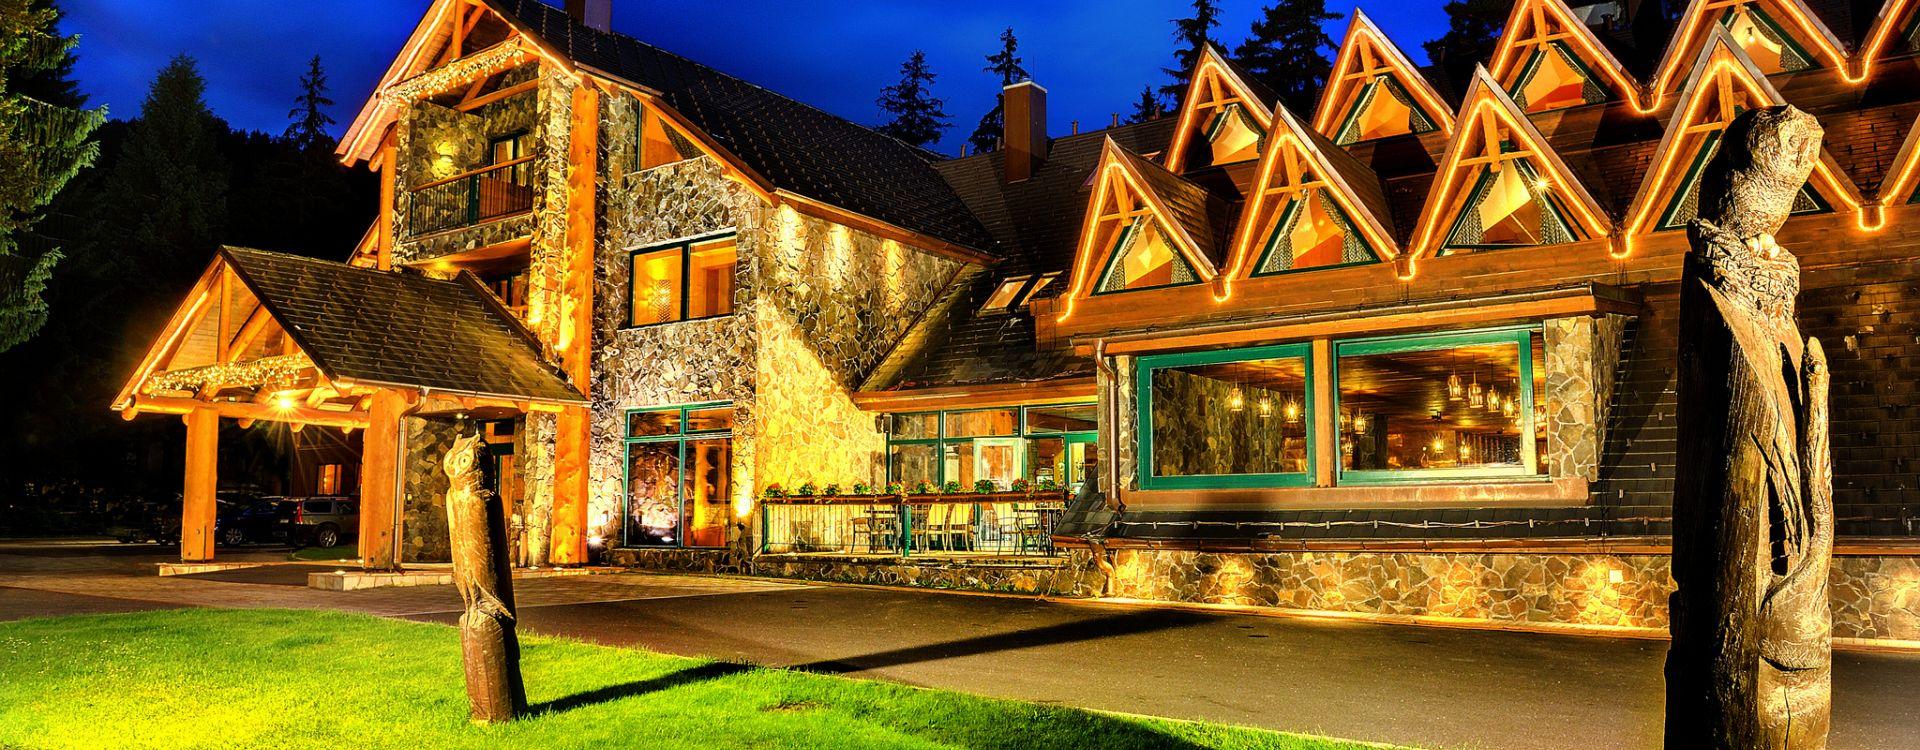 Boutique hotel t i studni ky wellness hotely for Boutique hotel wellness